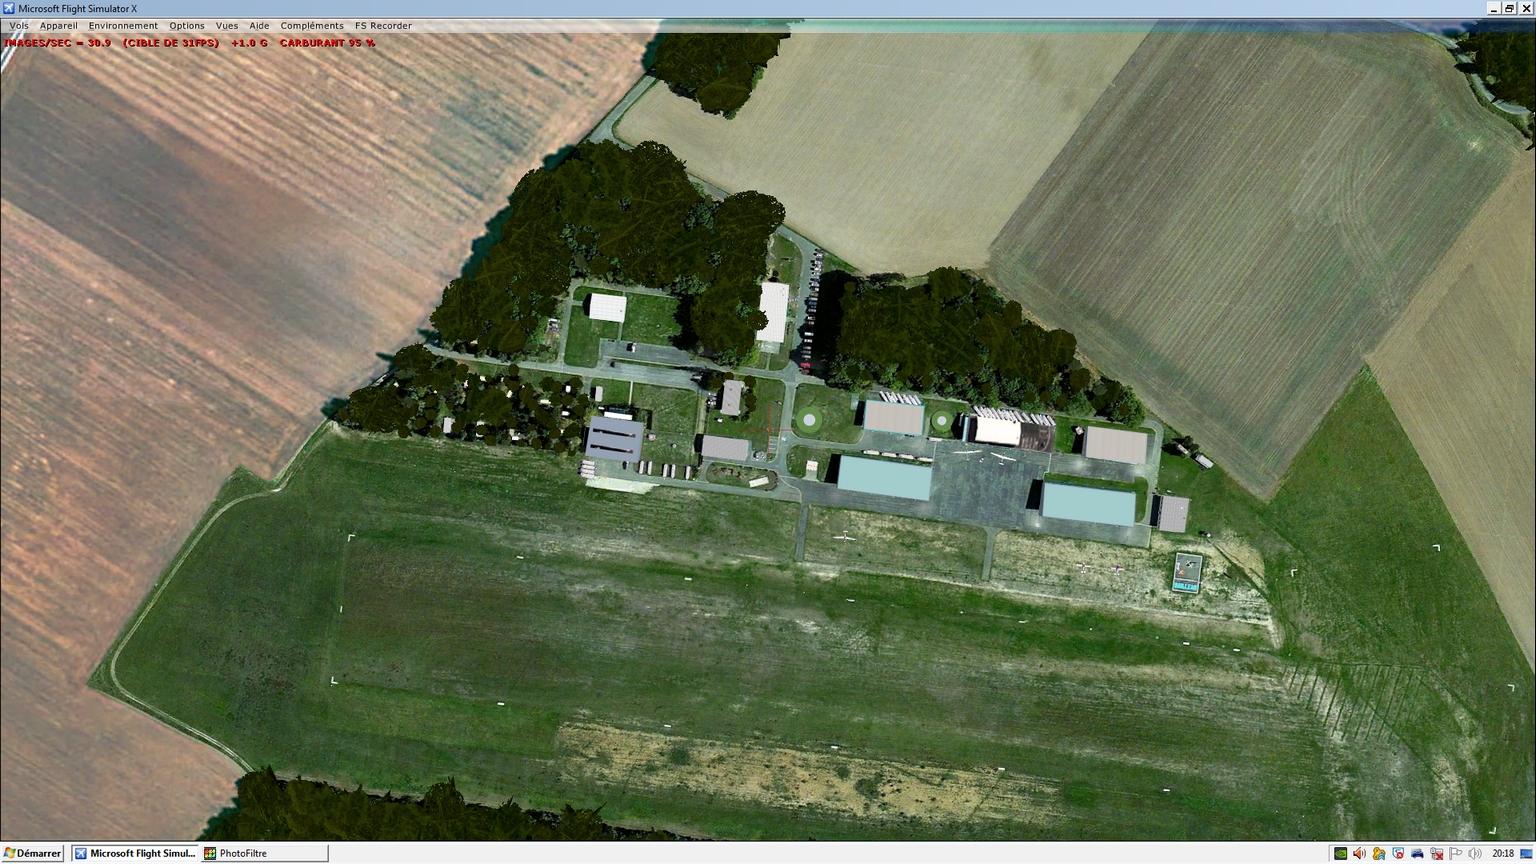 http://www.pilote-virtuel.com/img/gallery/1495650459.jpg